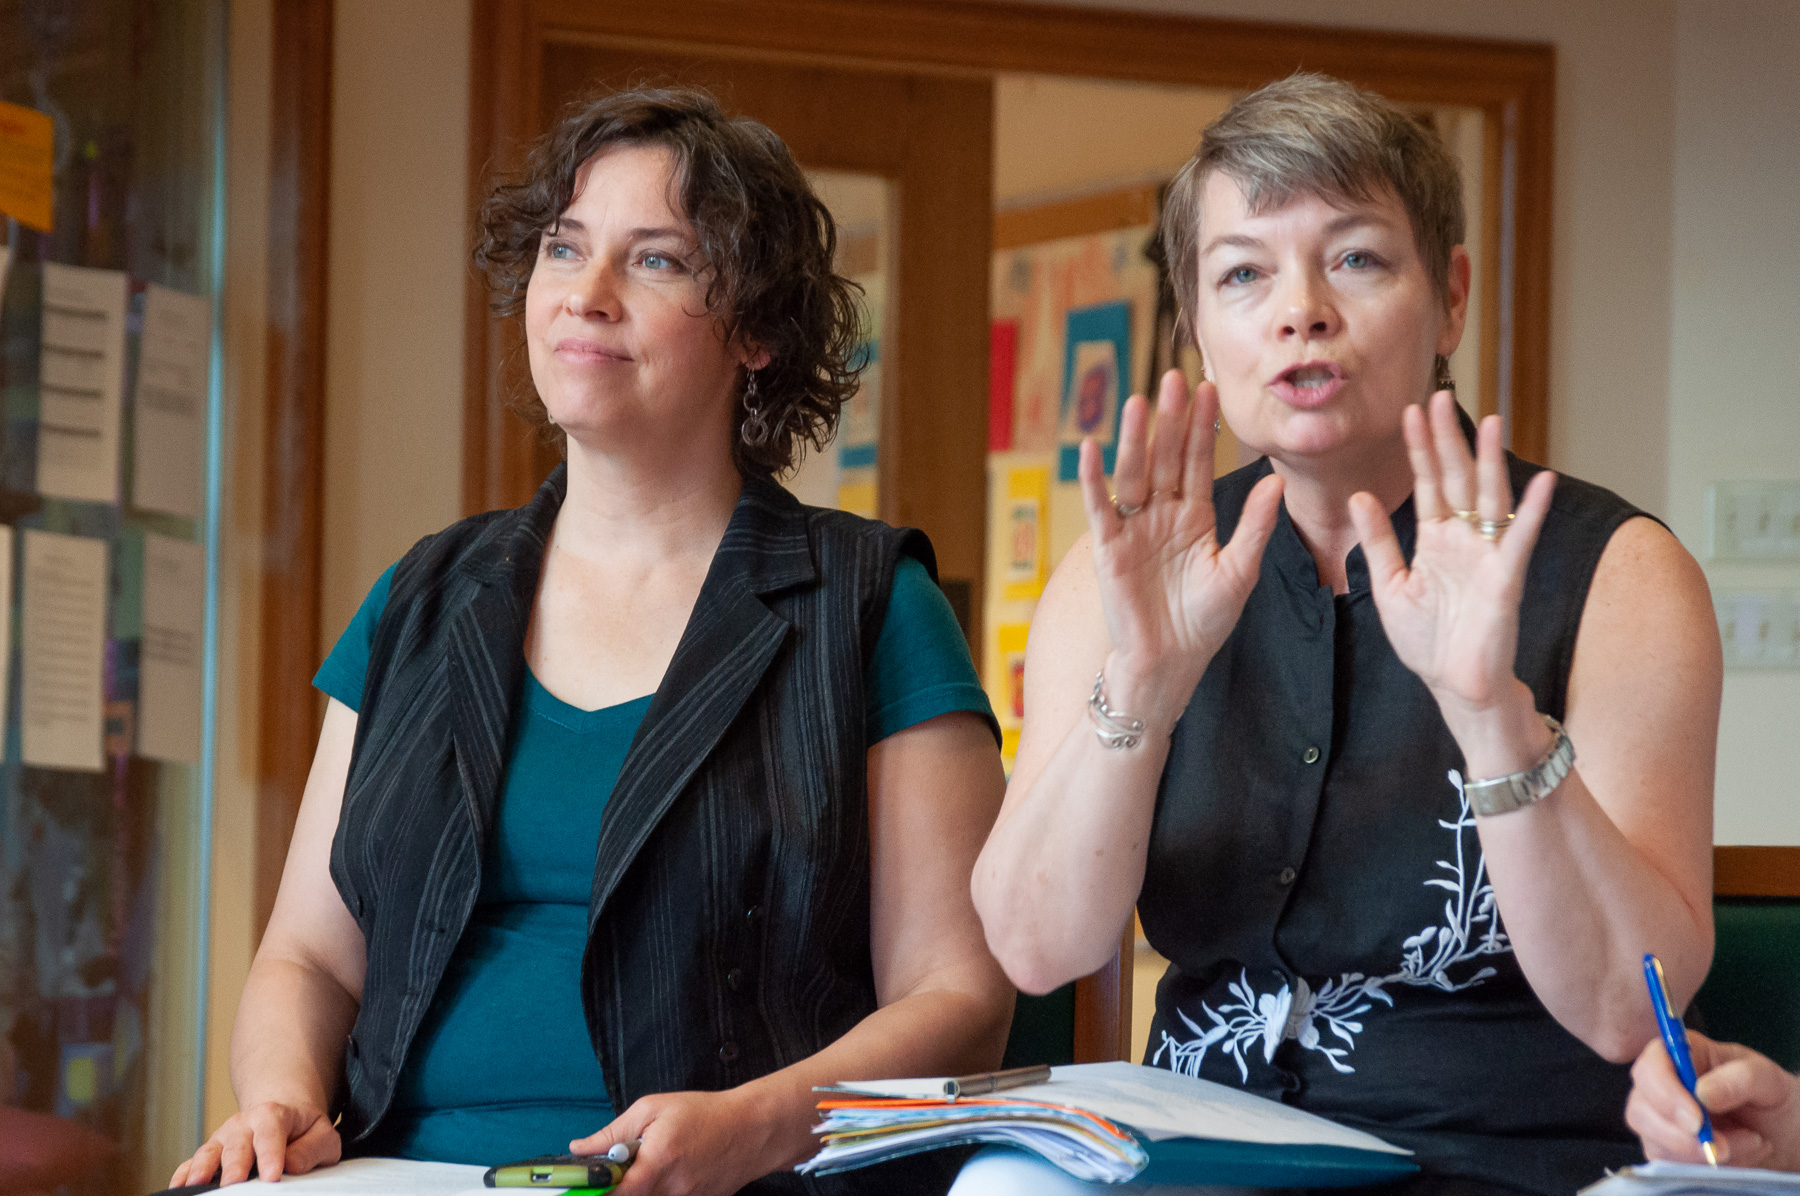 Co-facilitators Gwen and Janet